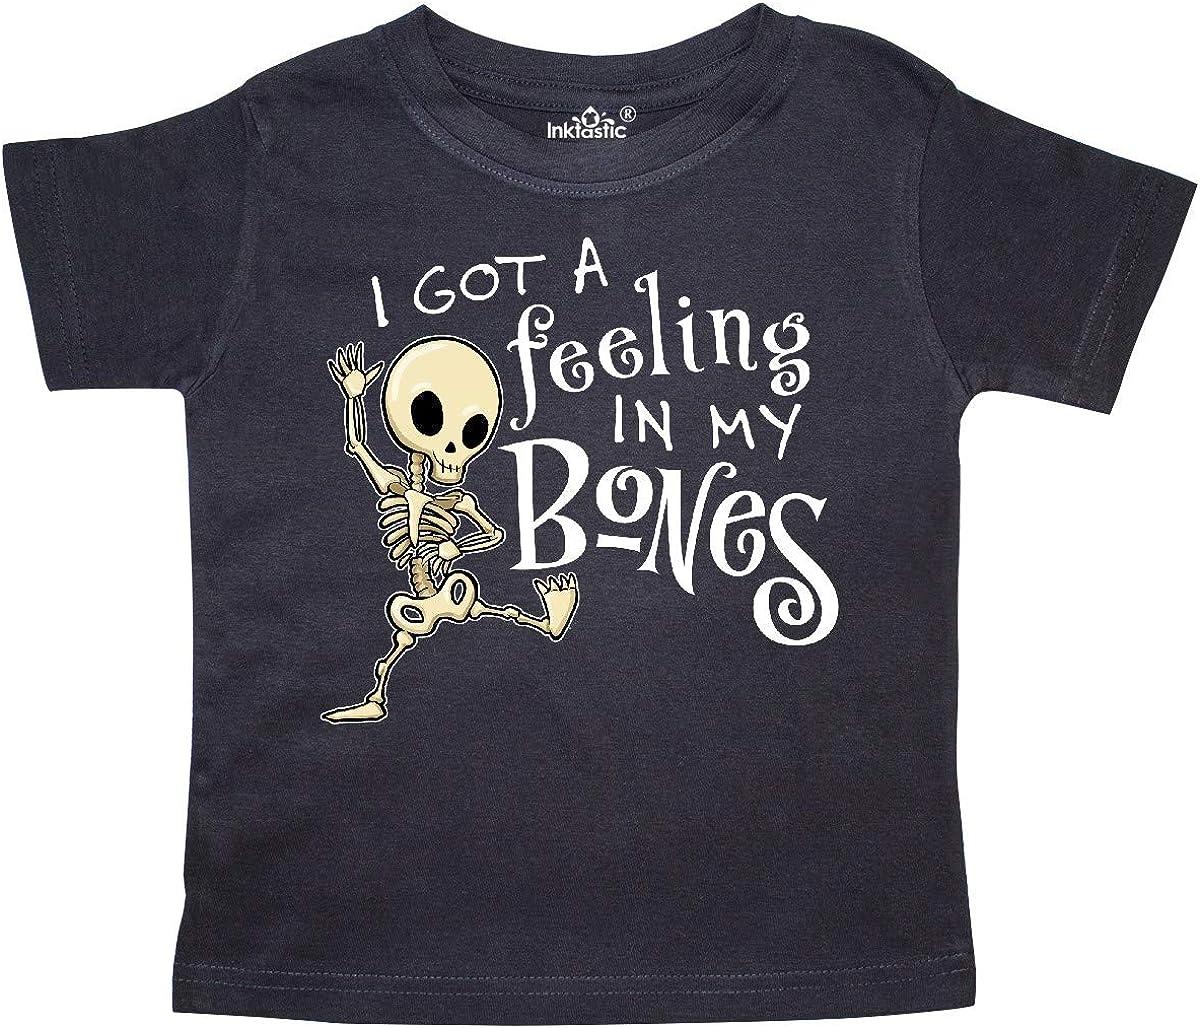 inktastic I Got a Feeling in My Bones with Dancing Skeleton Toddler T-Shirt